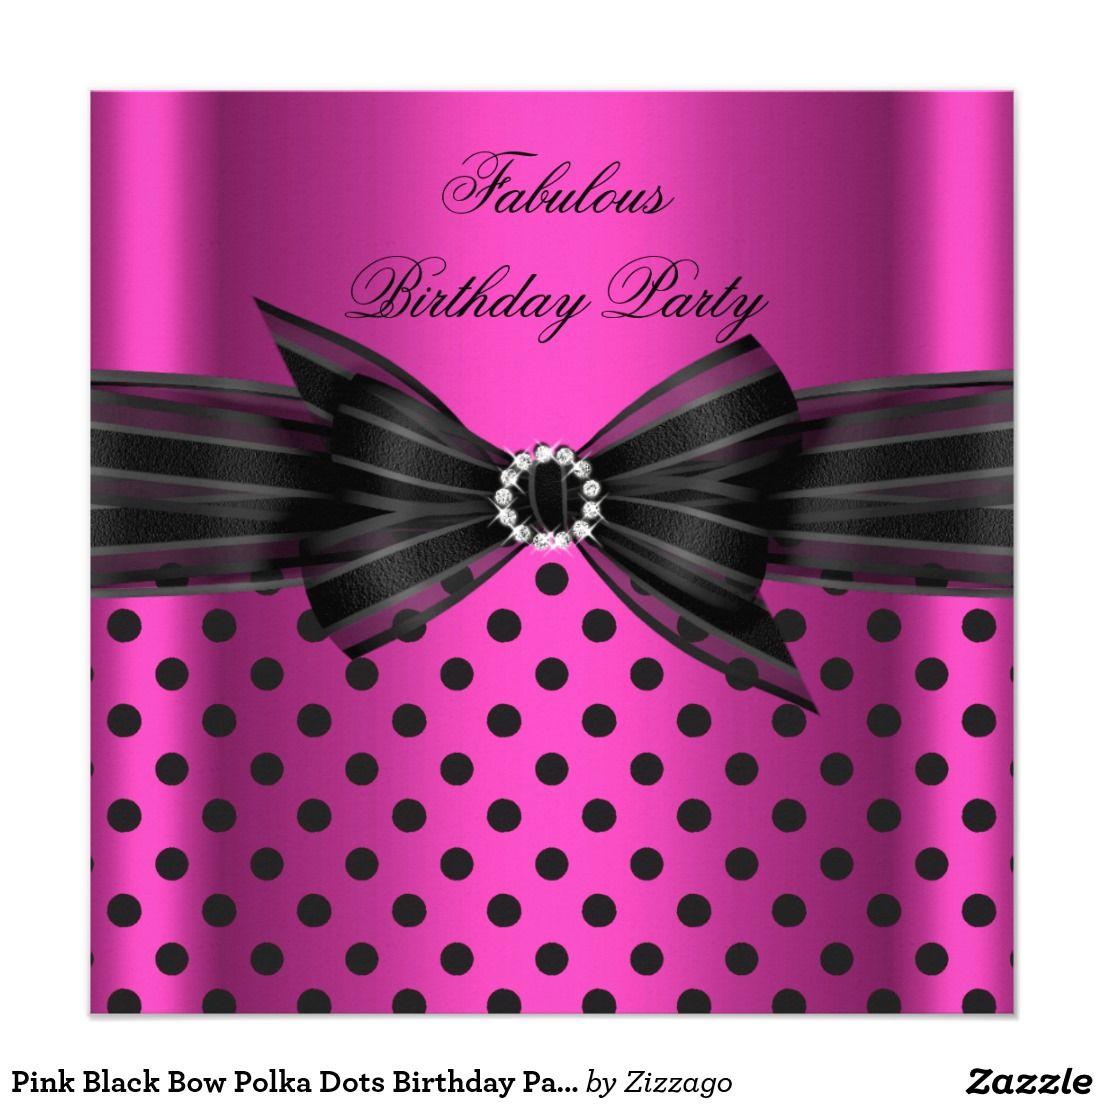 Pink Black Bow Polka Dots Birthday Party Card | Polka dot birthday ...